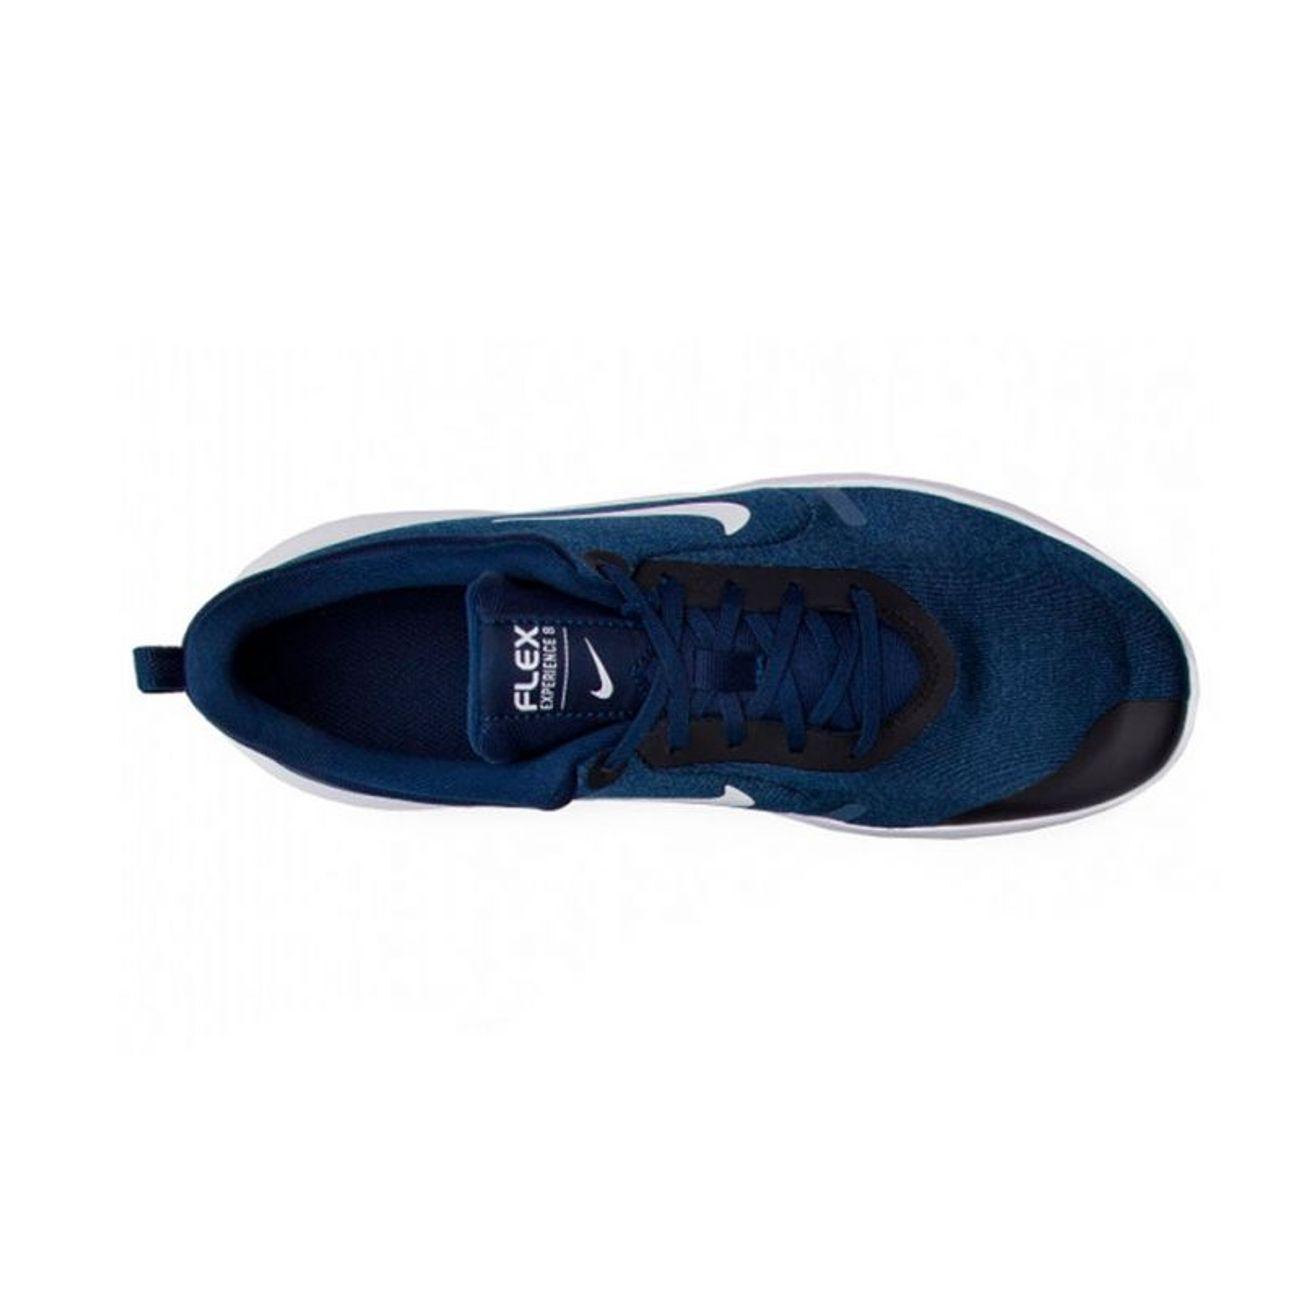 Nike Experience 8 Flex Niaj5900 Marino Padel Adulte Rn 401 Blu w0mvN8nO